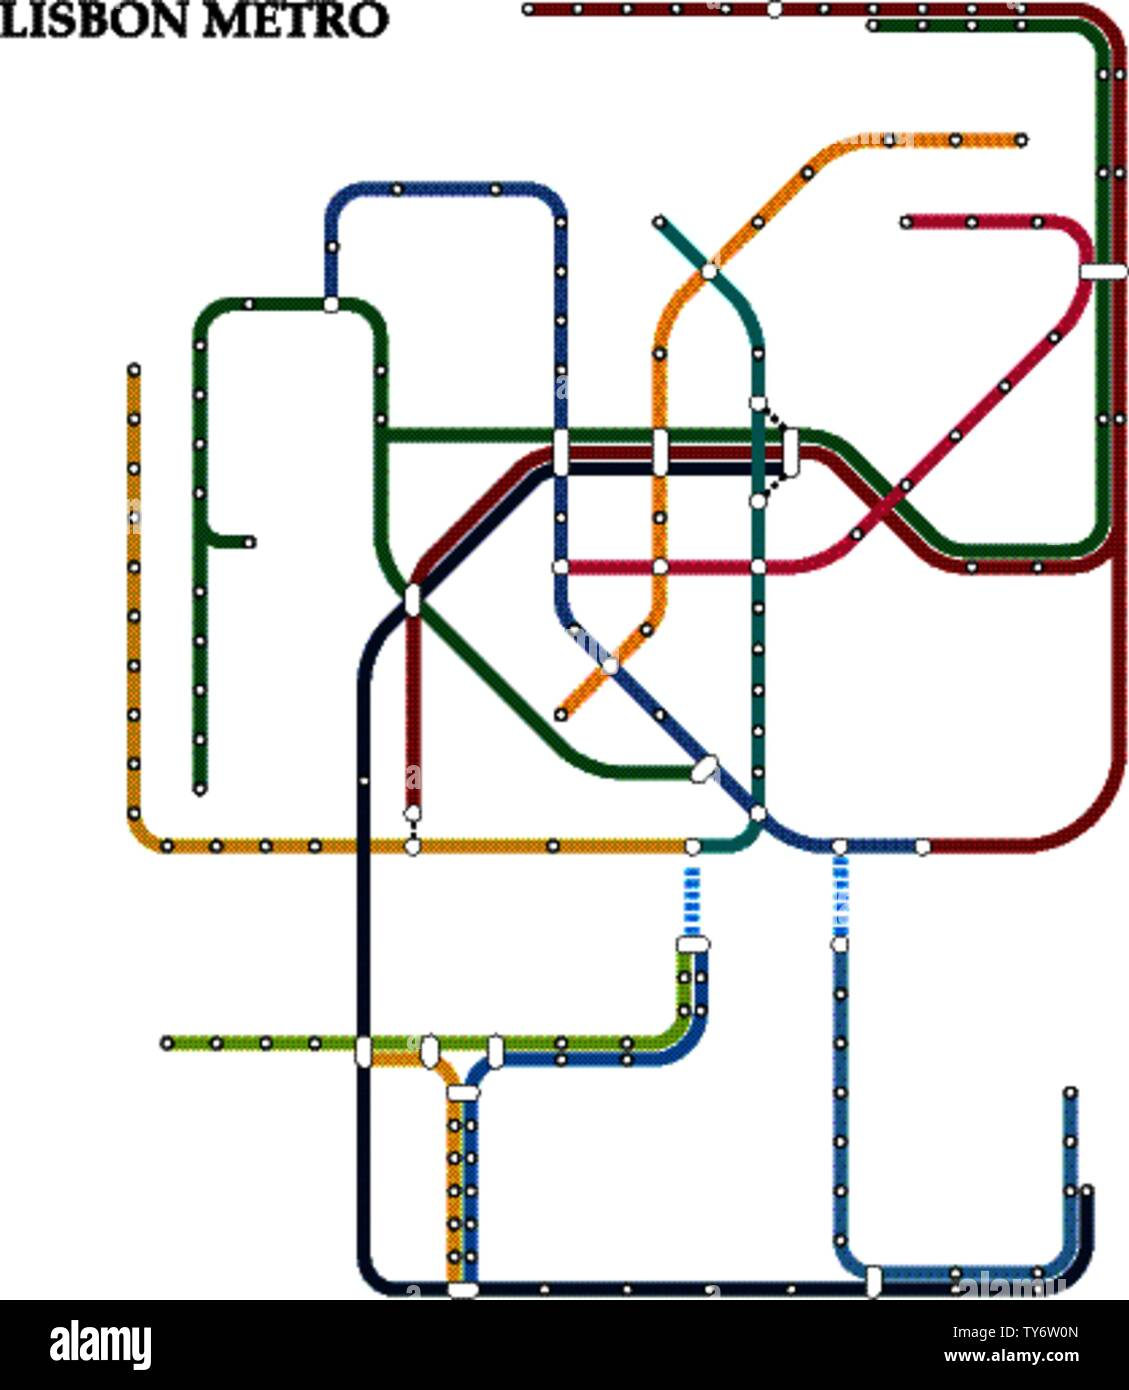 Subway Map Of Lisbon.Map Of The Lisbon Metro Subway Template Of City Transportation